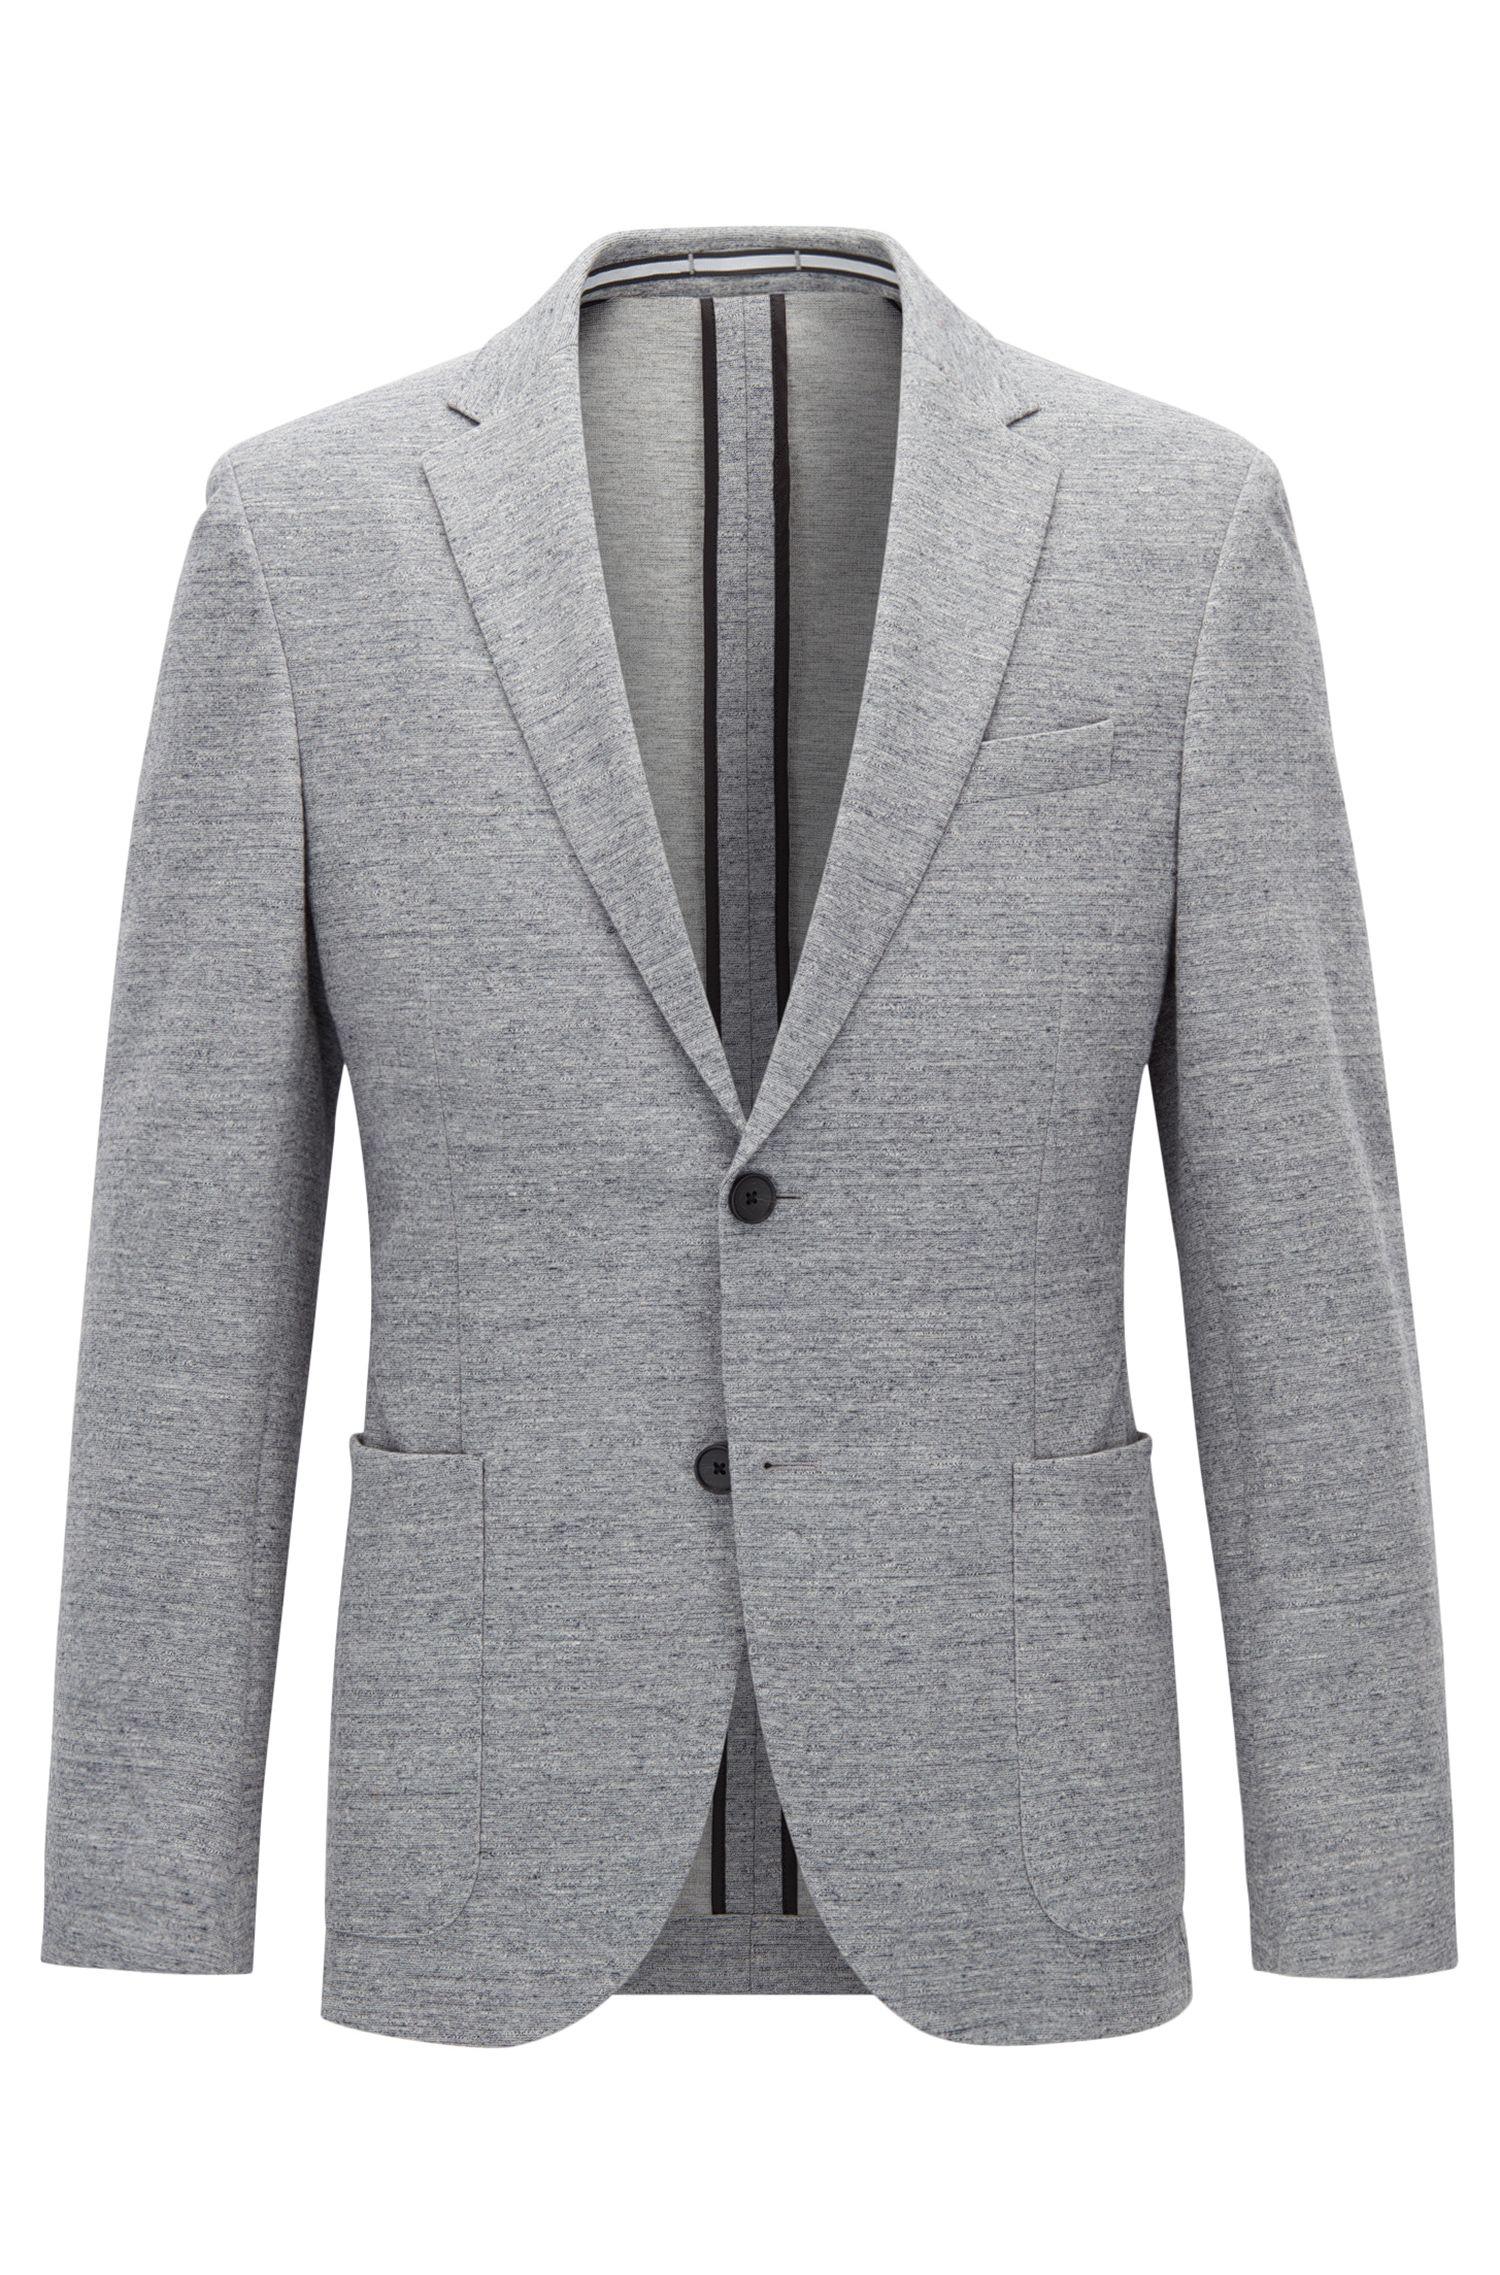 Jersey blend Tweed Sport Coat, Slim Fit   Newon J